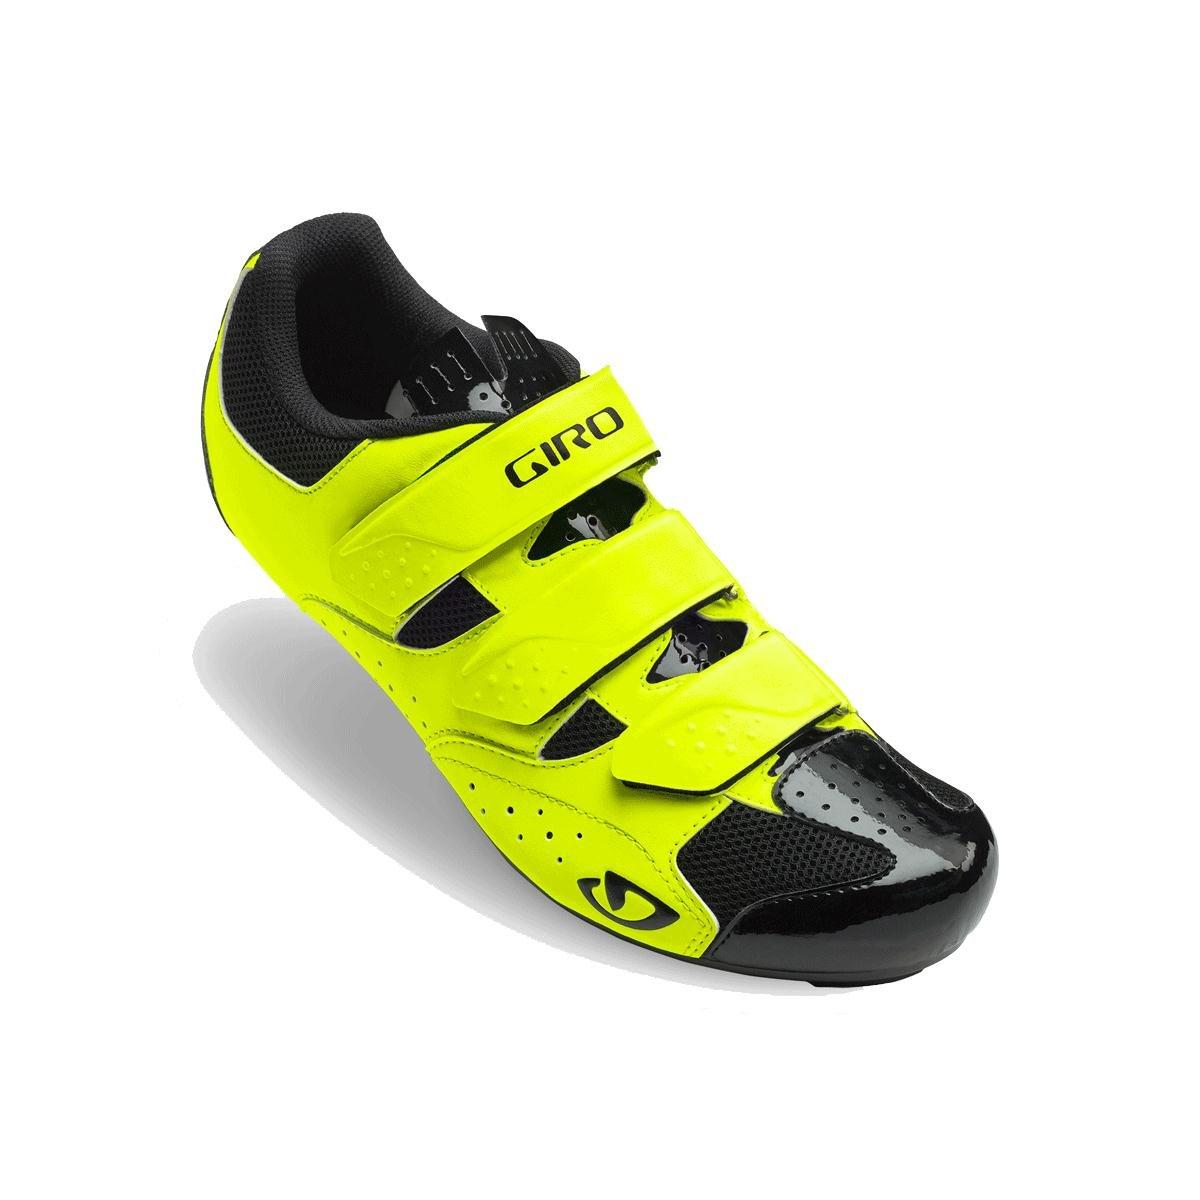 Giro Techne Cycling Shoes - Men's B075RRJ114 43 Highlight Yellow